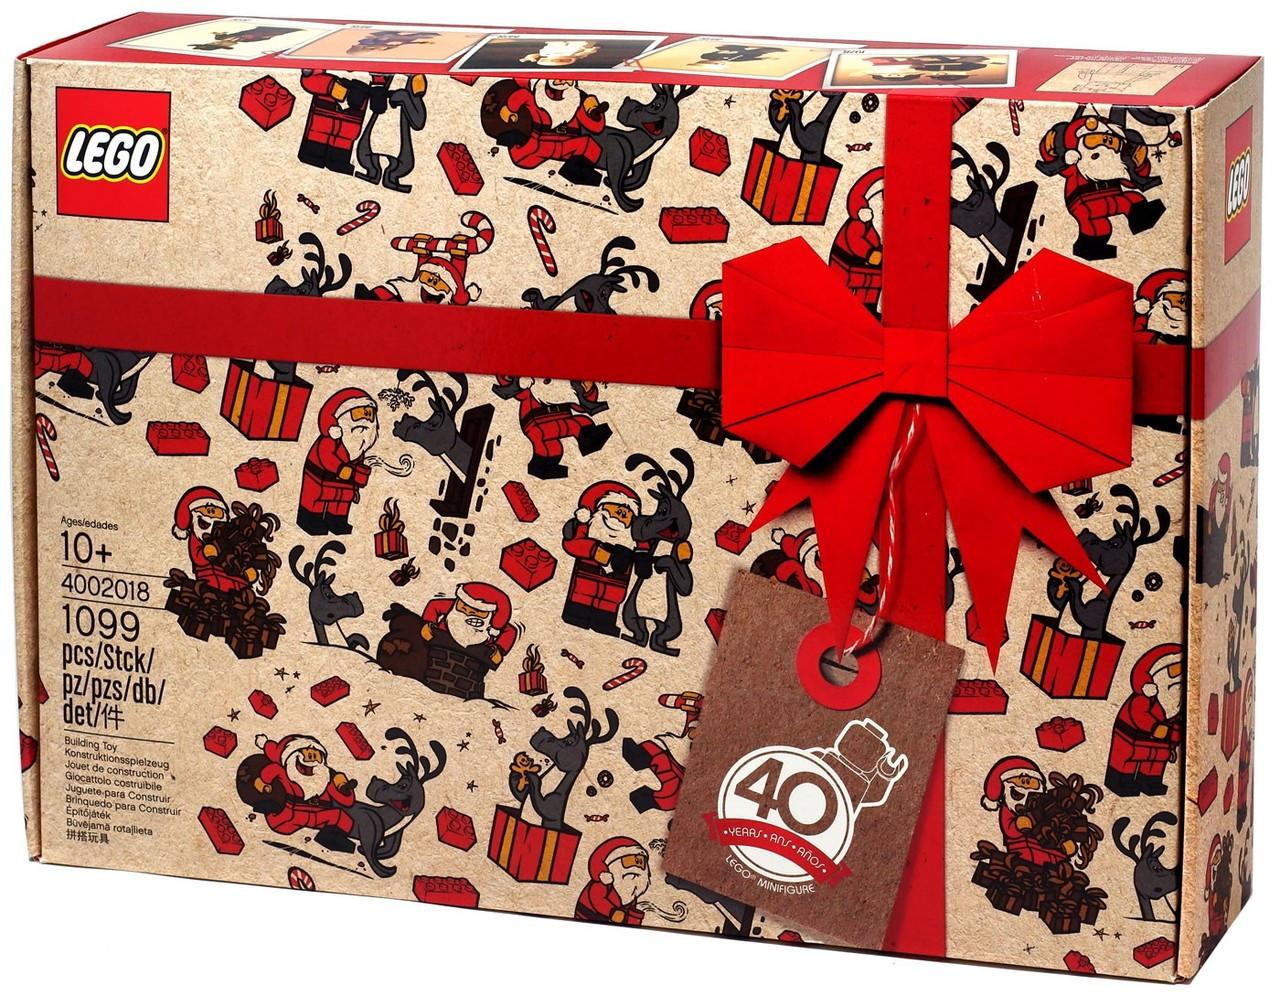 Christmas Gift Sets.Lego Employee Christmas Gift Set 4002018